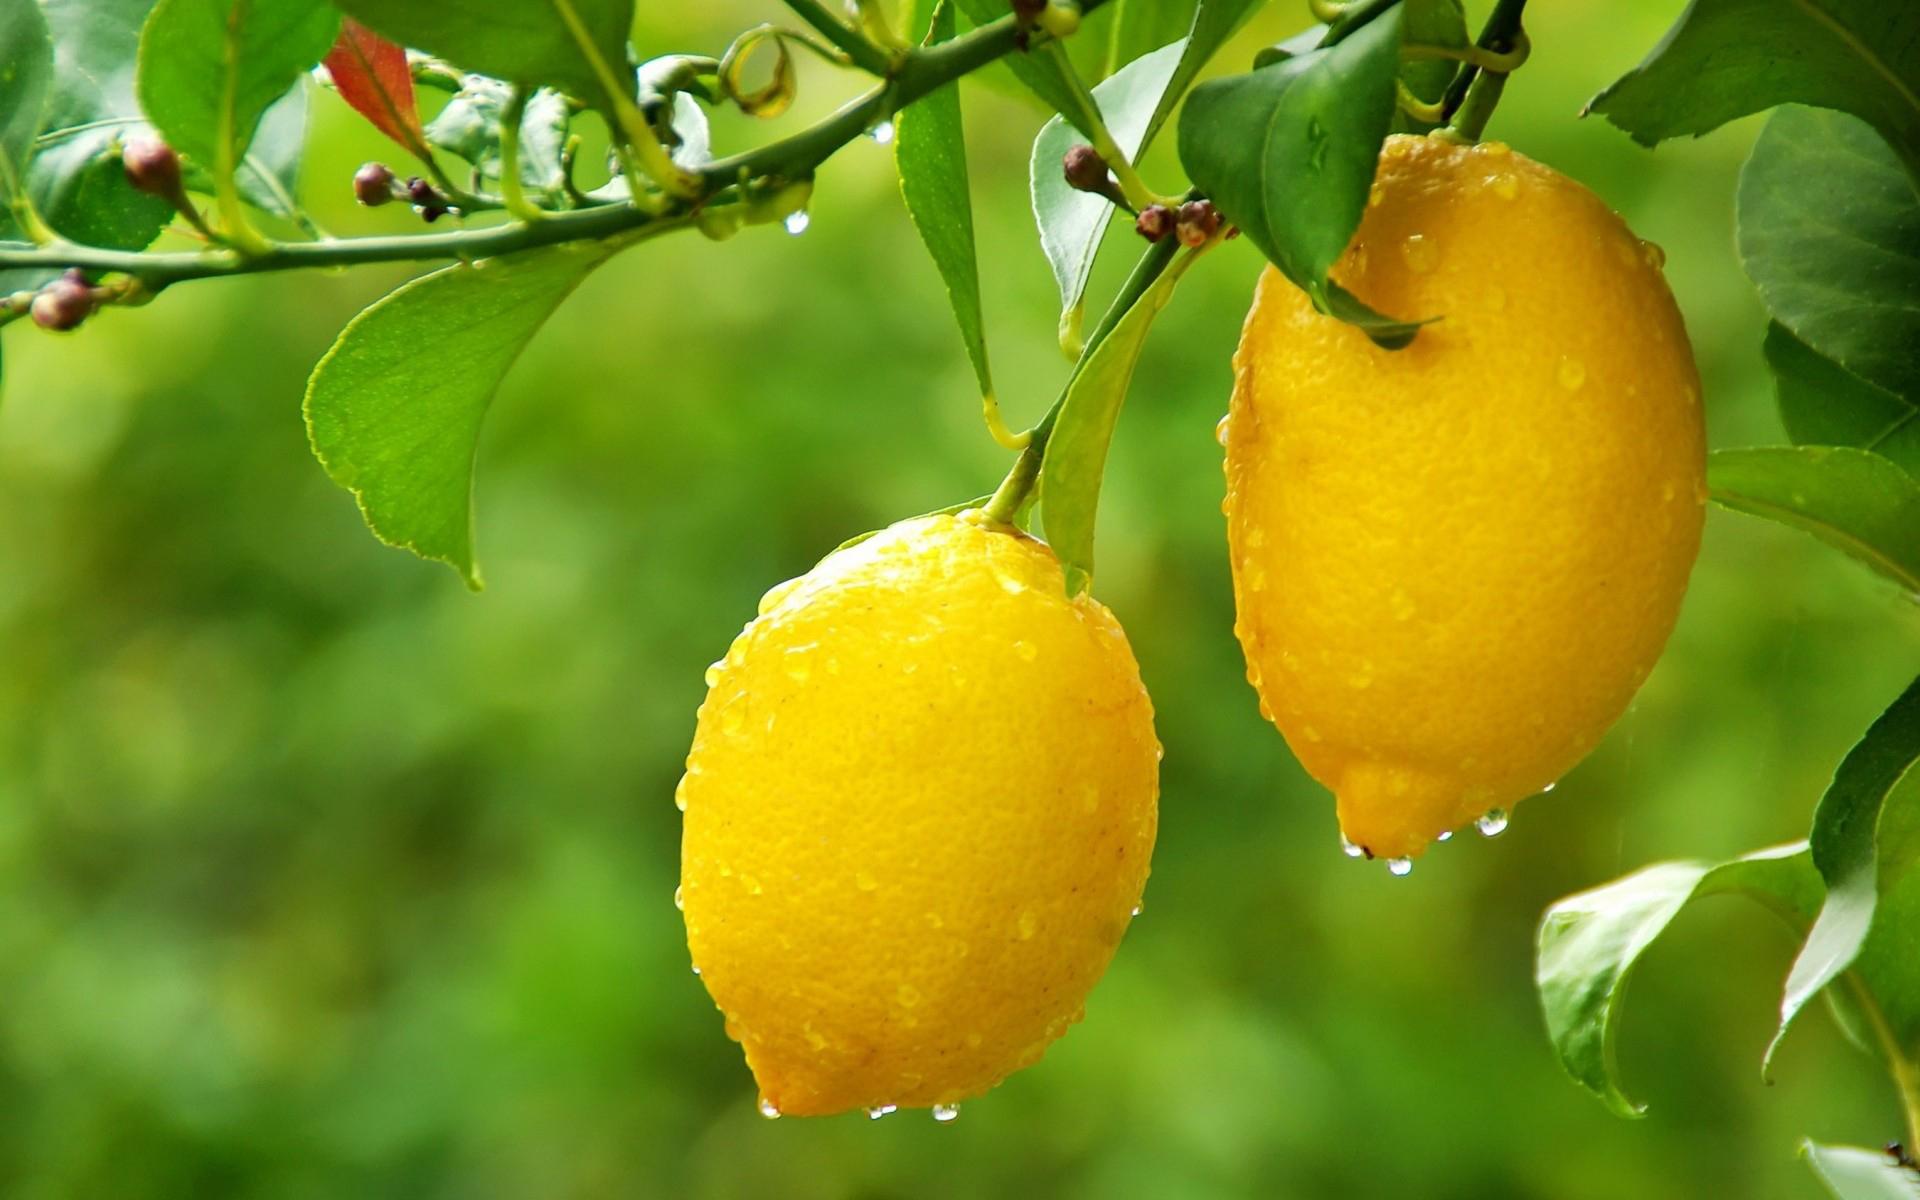 Fantastic Lemon Tree Wallpaper